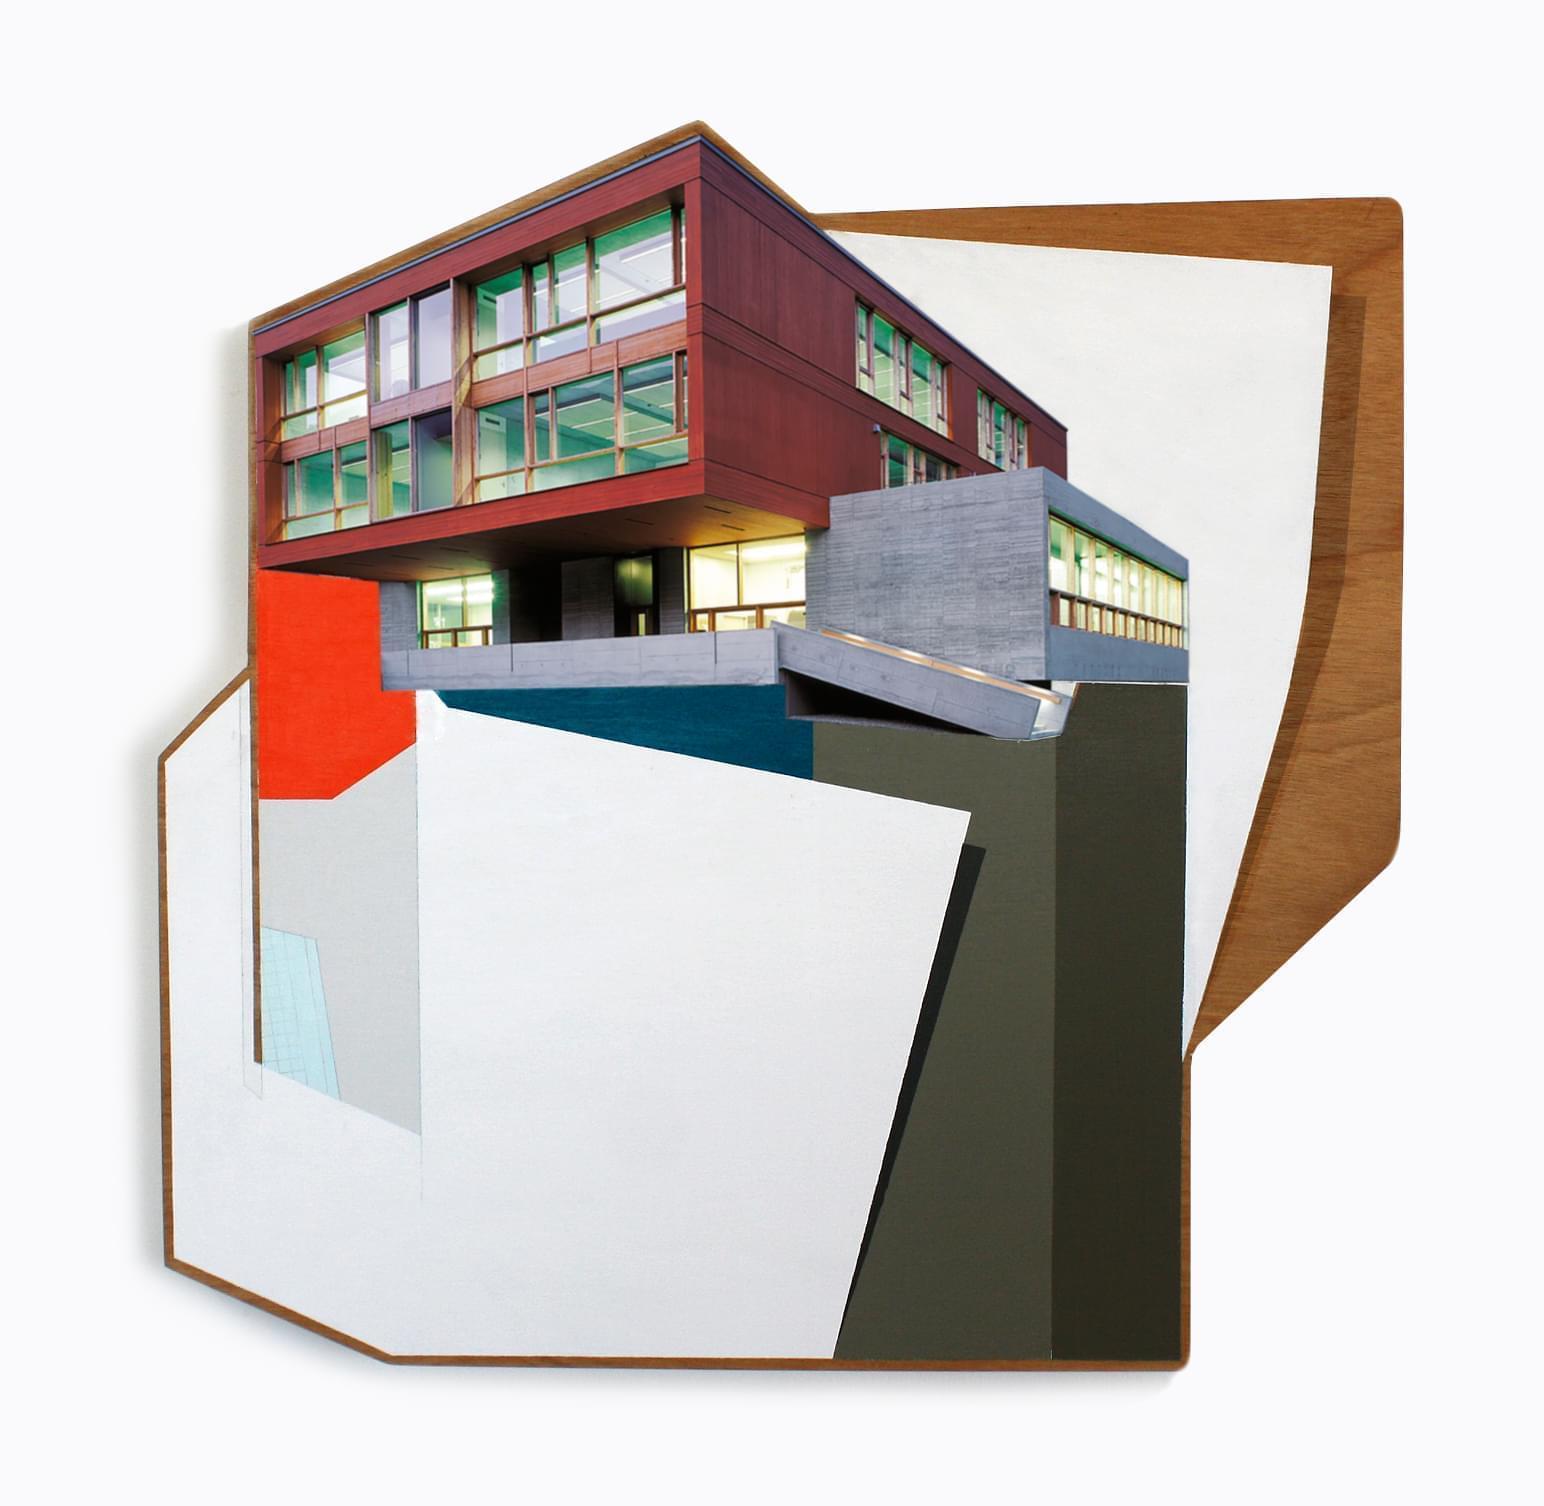 5. Modular VII Técnica mixta sobre madera 65,5 x 65,5 cm 2018